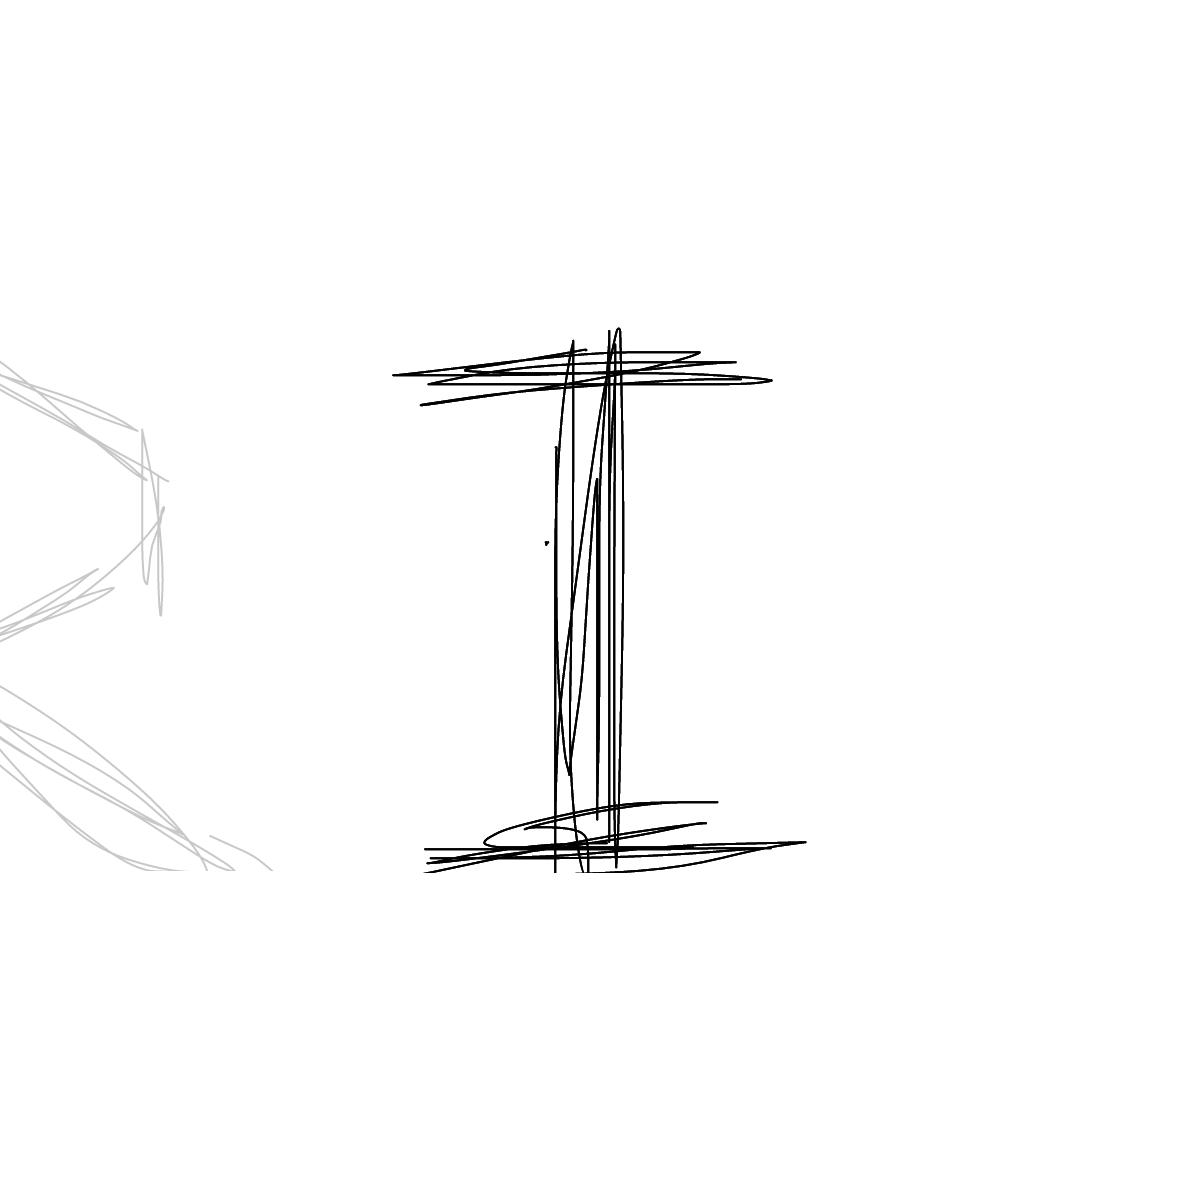 BAAAM drawing#23436 lat:77.0888671875000000lng: 156.5494842529297000